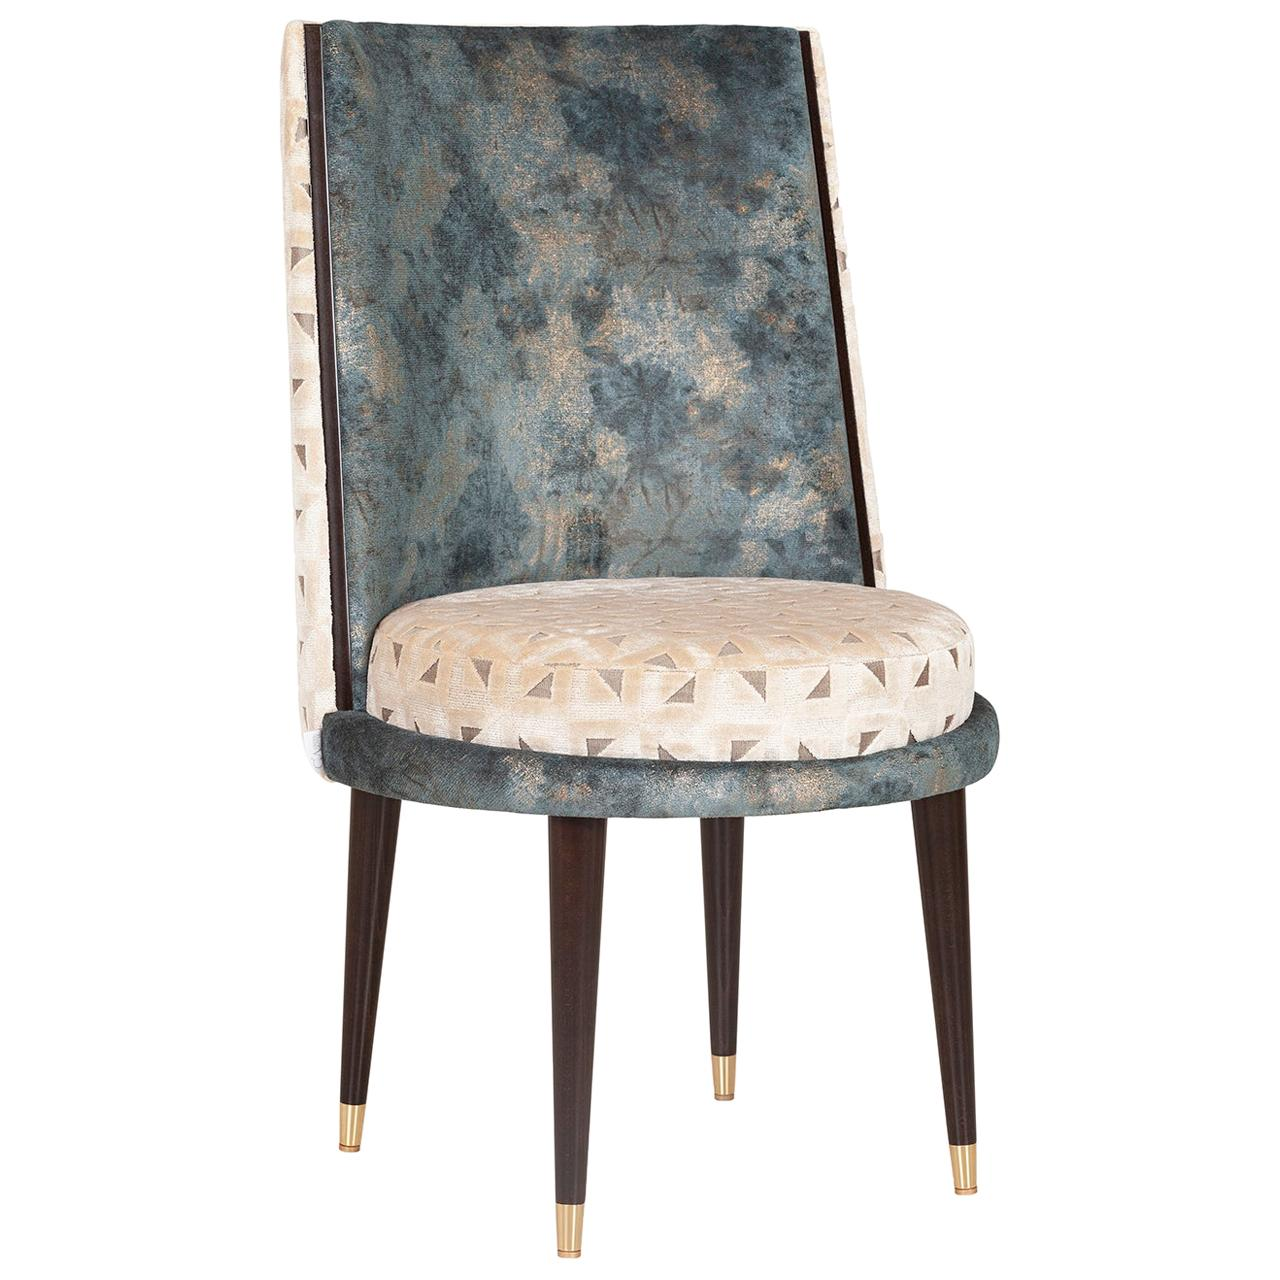 De Castro Chair Beech Dark Brown Stain Polished Brass Blue-Green Beige Velvet